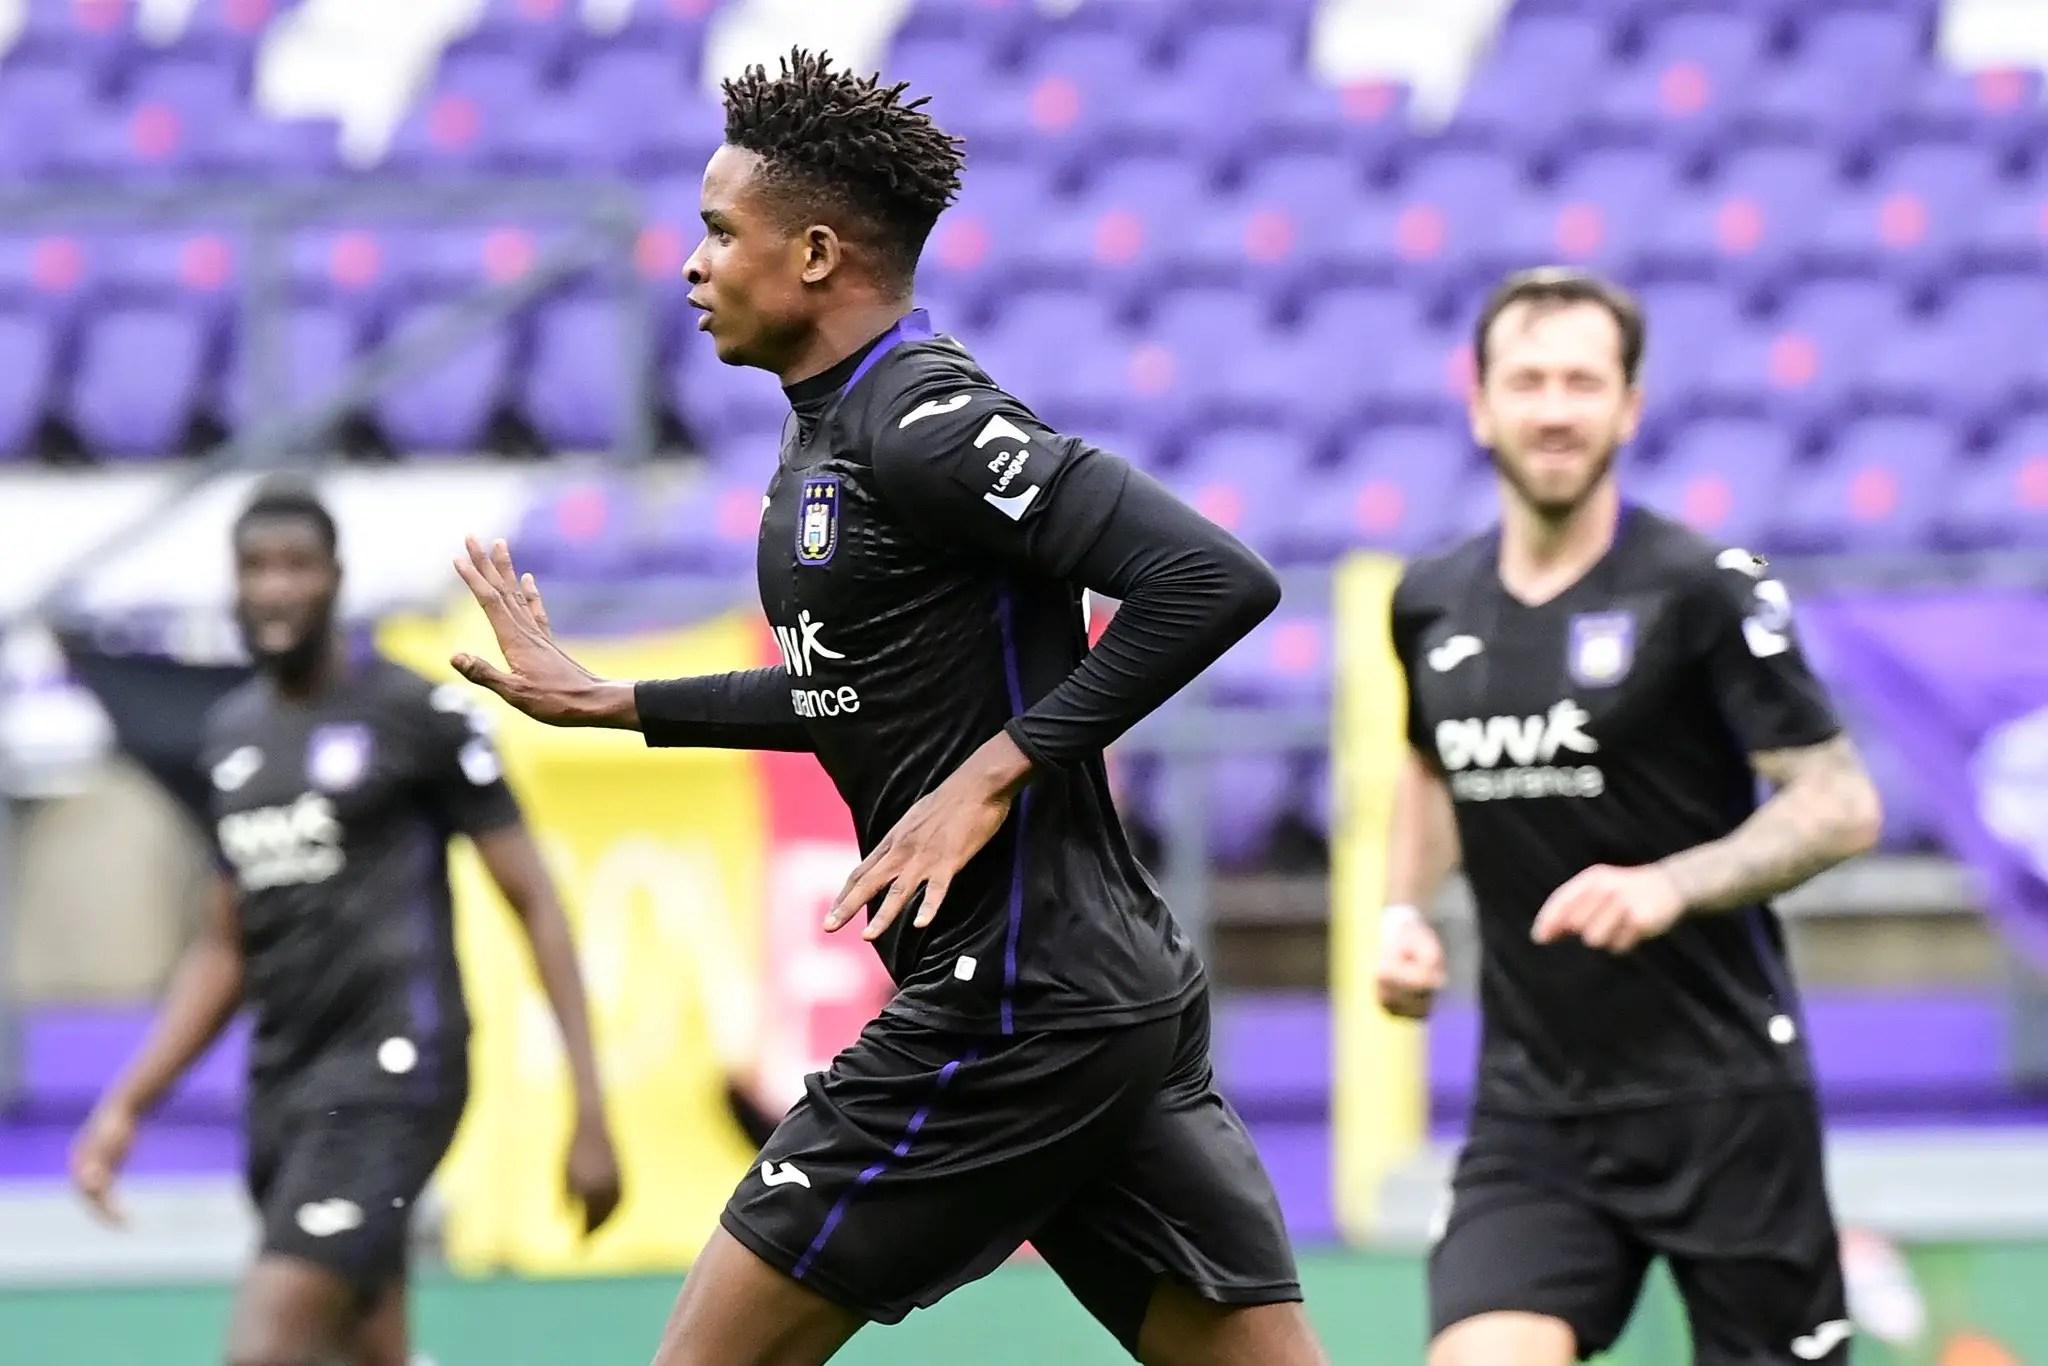 Kompany Backs Mukairu To Become A Top Star In Belgium